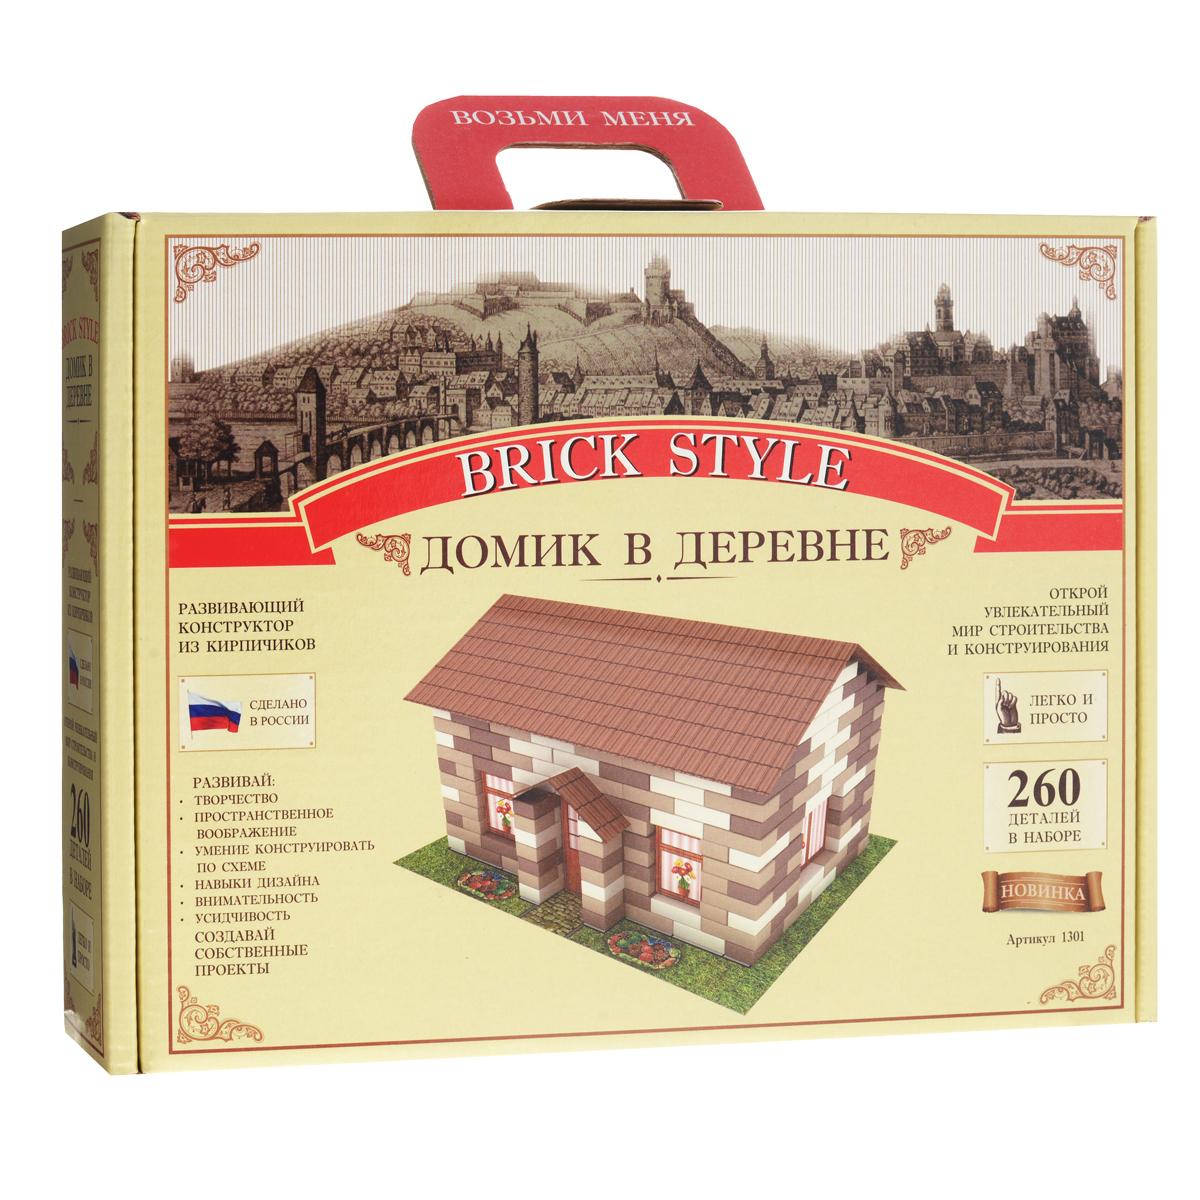 ����������� Brick Style ����� � �������, 260 ��������� - ������1301��������� ������������� Brick Style ����� � ������� ������ ��� ���������, ������ ����� ������. ��������� ����� �� ��� ������ ������� ������ ������ � ���������� ������ ������� ������� - �� ���������� ������ �� ���������� �����. ������� ����������� ����� ����� ������ ��������� ���, �� ��� ����� ��������� ���� �����. � ��������� ���������� ������� ��� ���� �� ������ ��������� ������. ������������ � ���������� ���� ����������� ��������� - ���������� � �������� �� ����������! ����������� ��������� ��������� ����������, ���������������� �����������, ������ �������������� �� �����, ������ �������, ��������������, �����������. ������ ��� ���� ������������� ��� ������������� � ���������������.